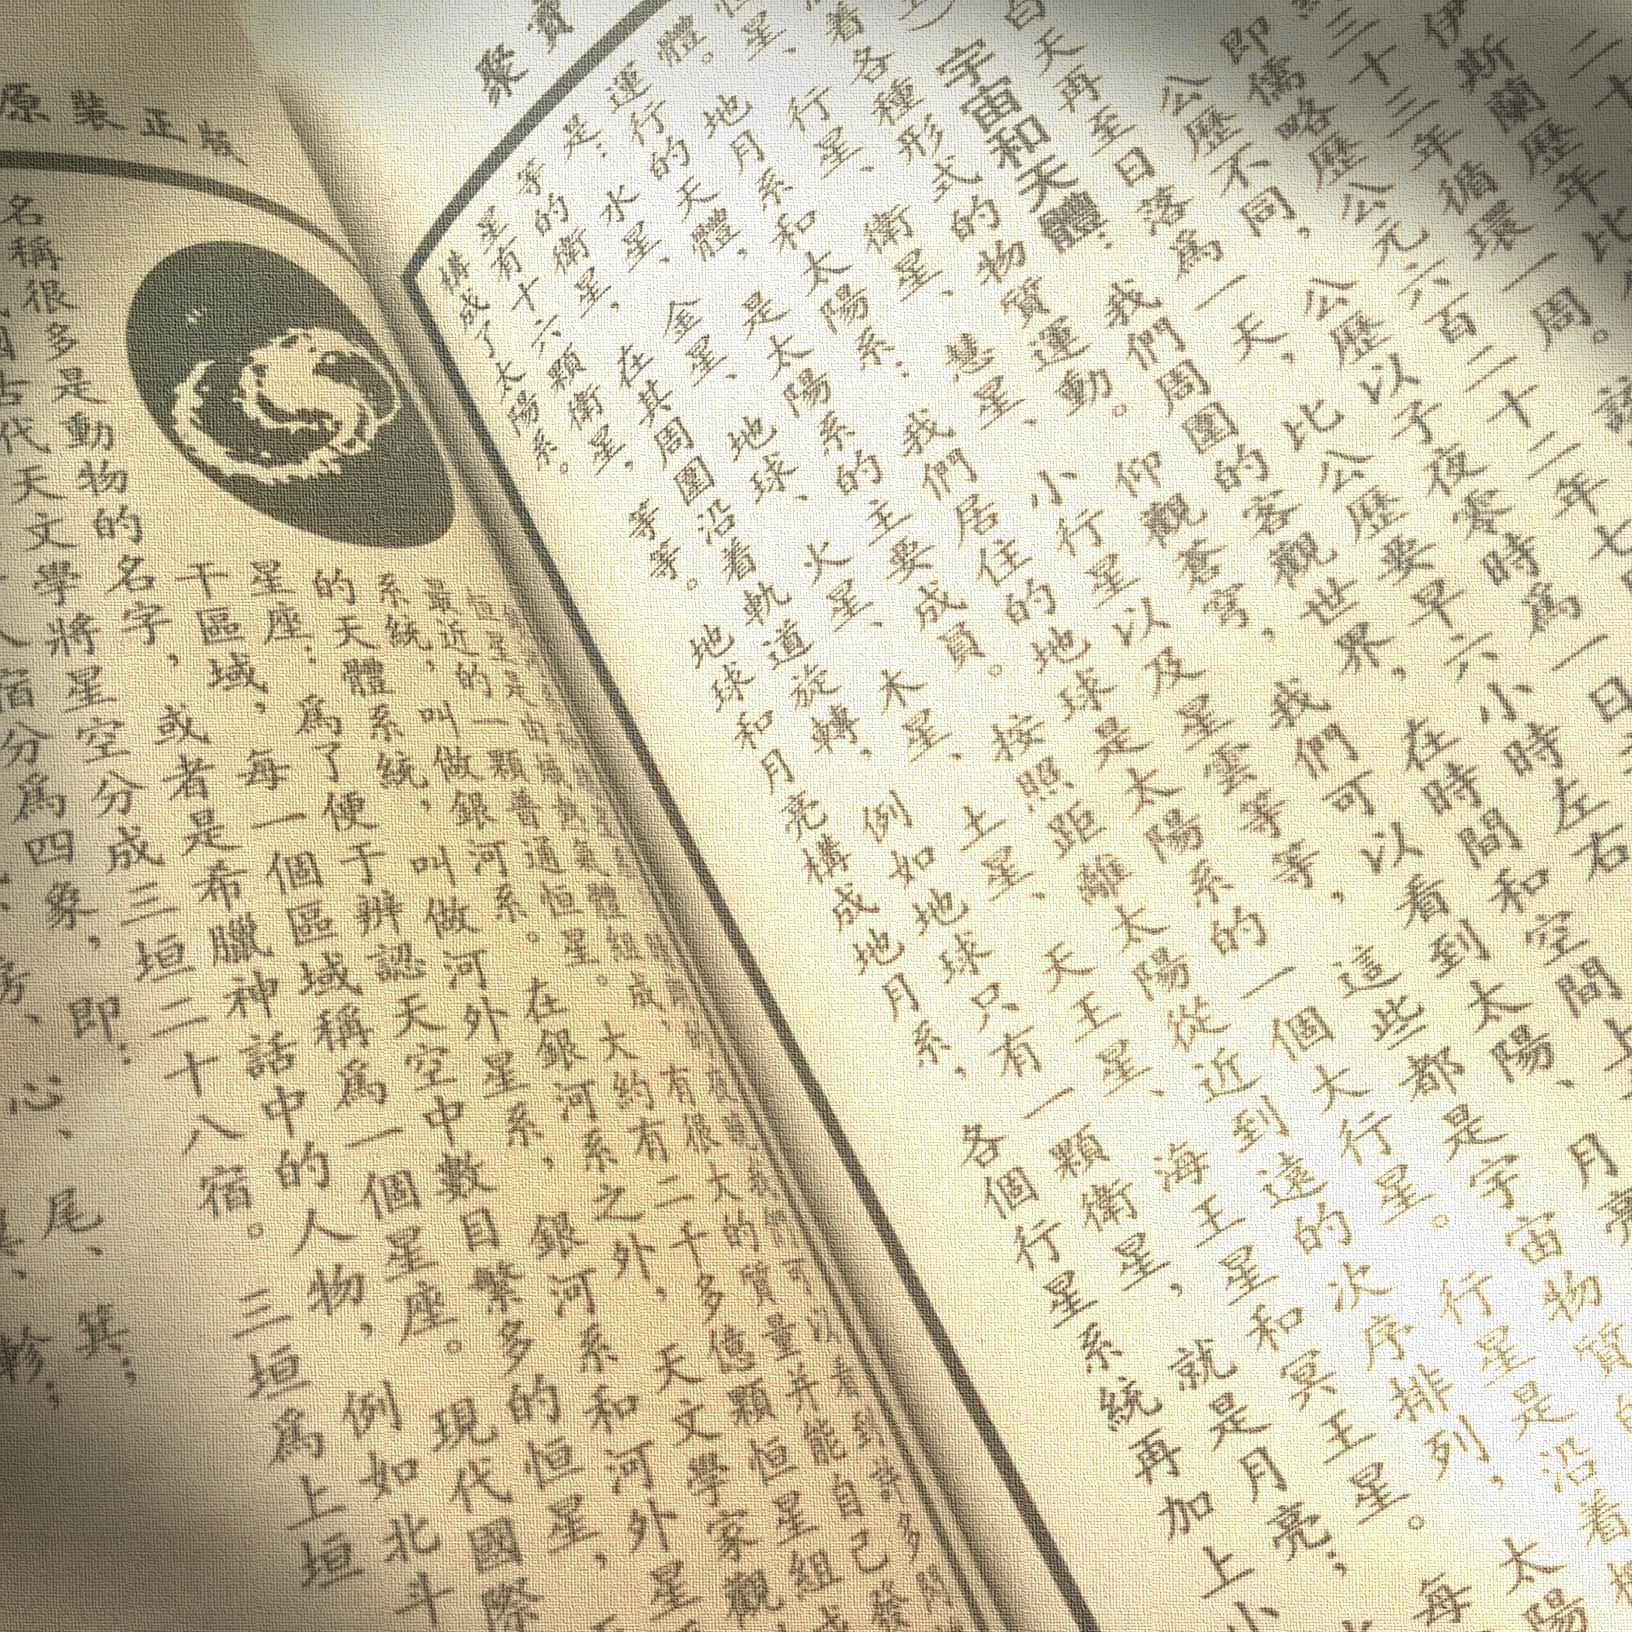 Tong Shu Ze Ri Date Selection for Businesses